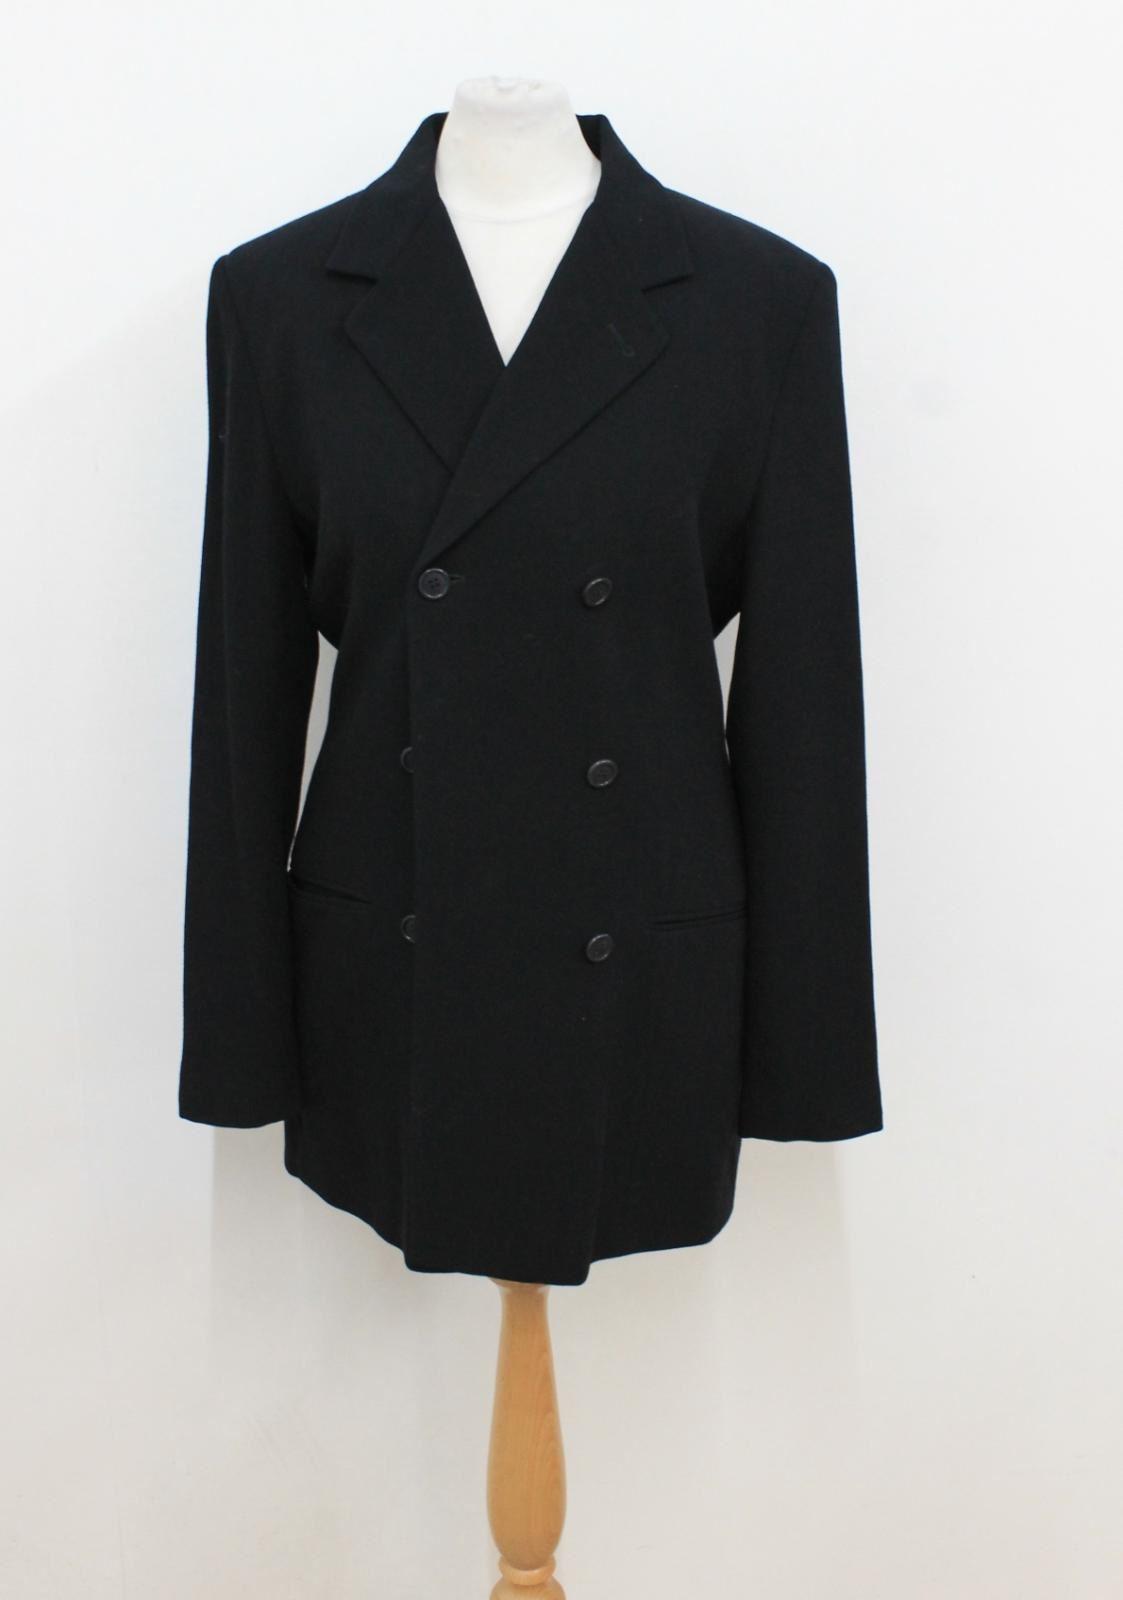 Calvin Klein Ladies Black Double Breasted Wool Suit Jacket Size Approx. S Senility VerzöGern